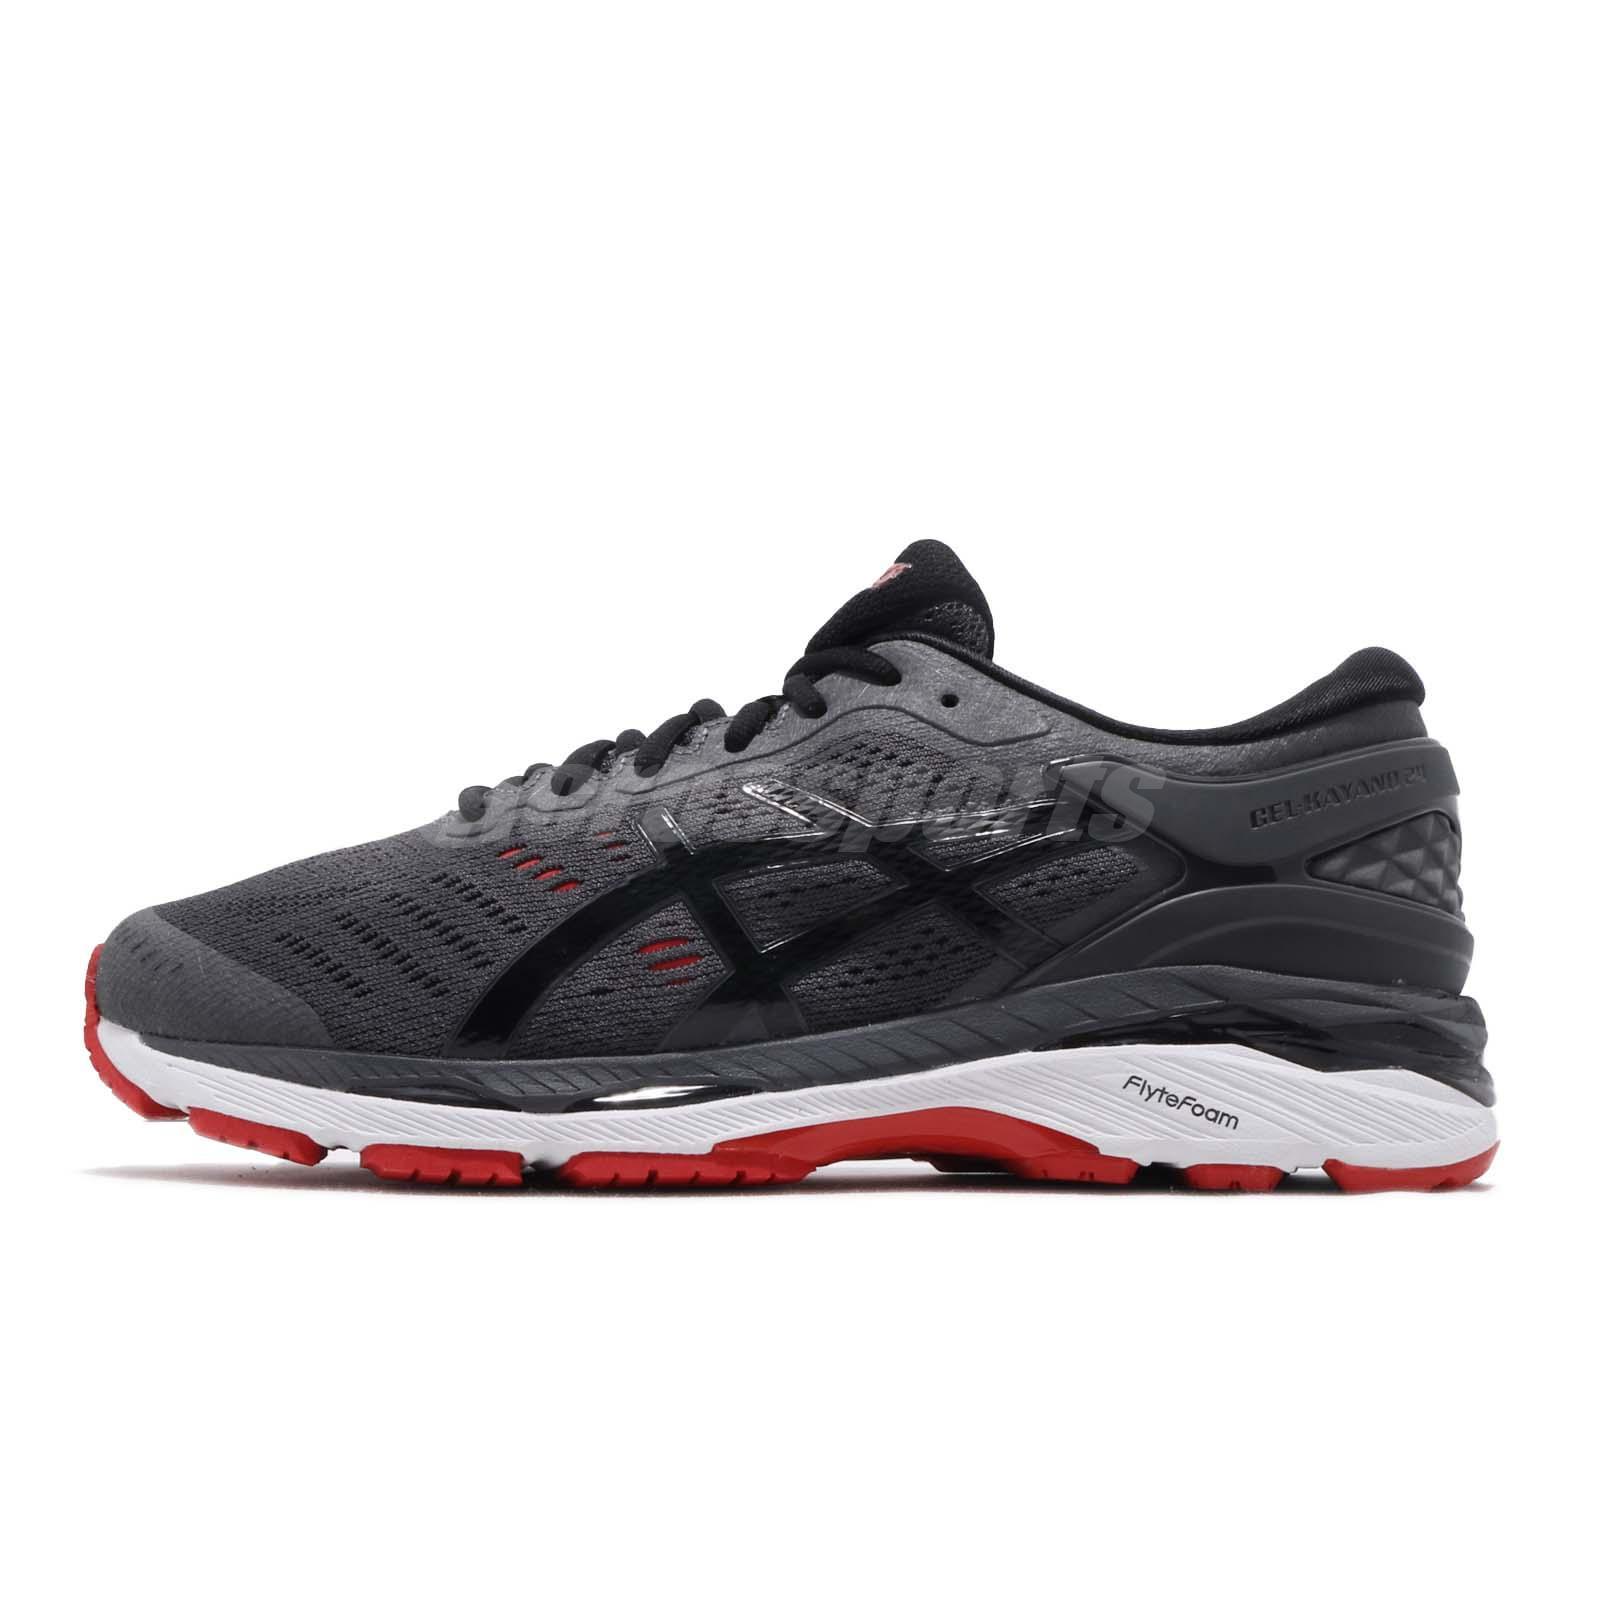 Asics Gel-Kayano 24 2E Wide FlyteFoam Grey Red Mens Running Shoes T7A0N-9590 f18b177f32fda